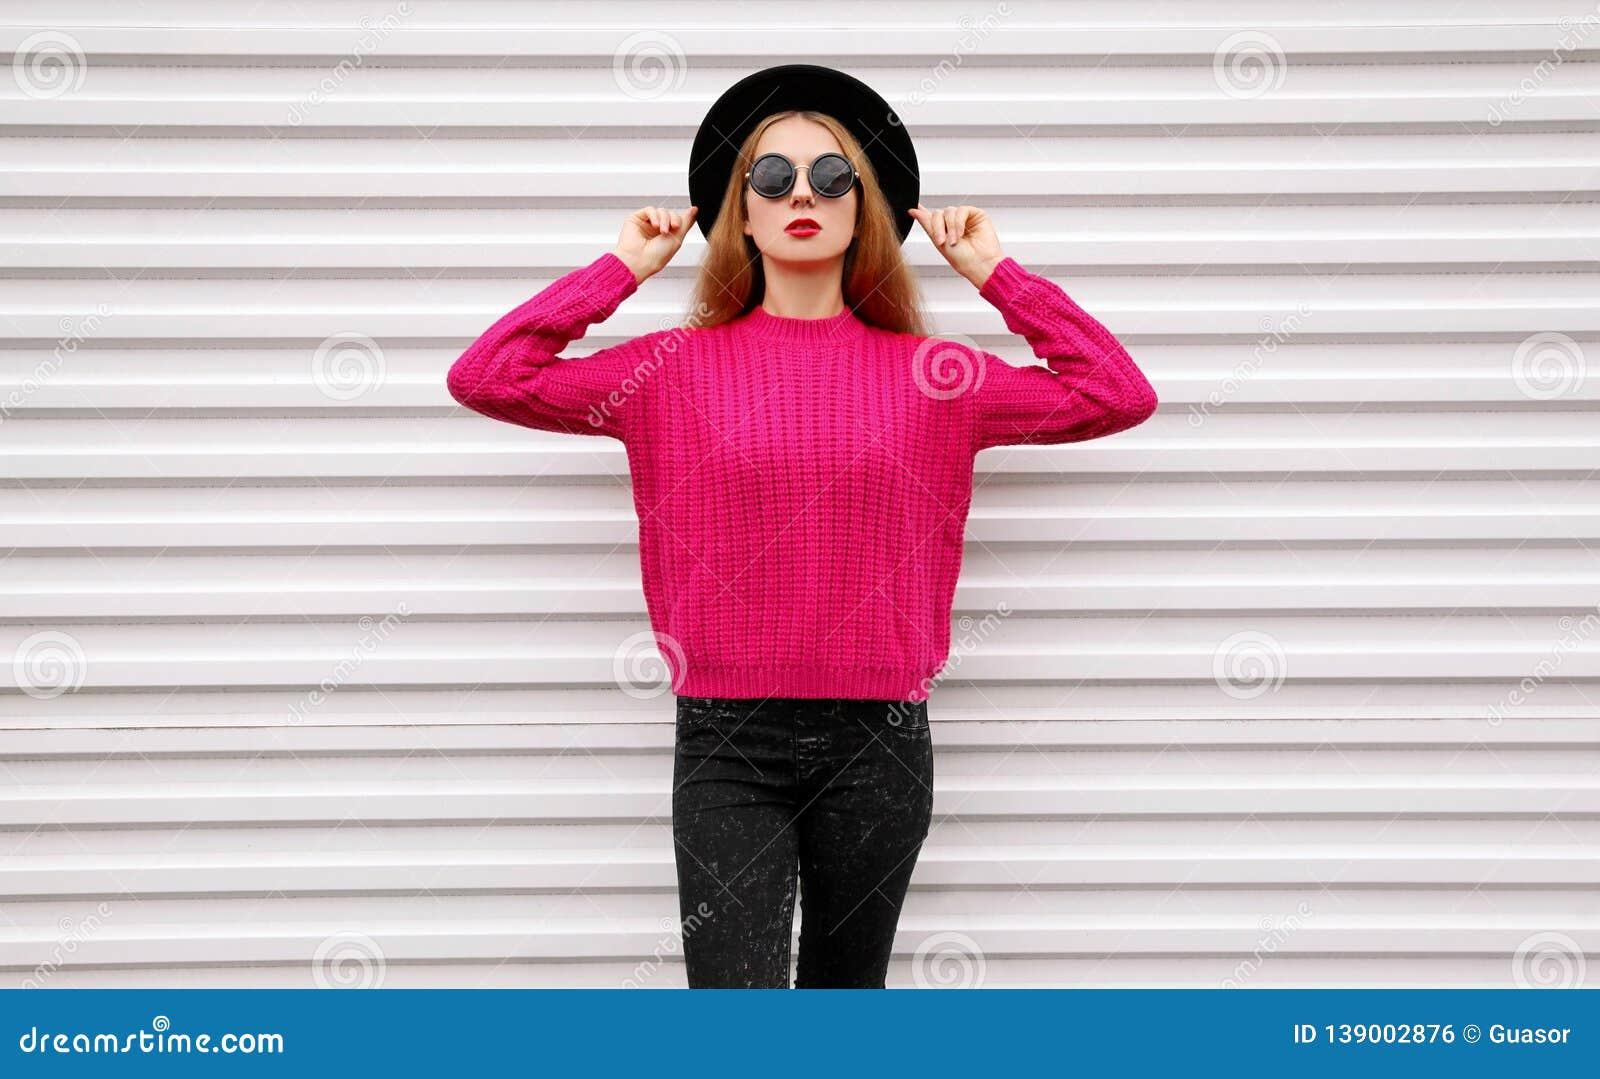 Modelo bonito à moda da mulher que levanta na camiseta feita malha cor-de-rosa colorida, chapéu redondo preto na parede branca